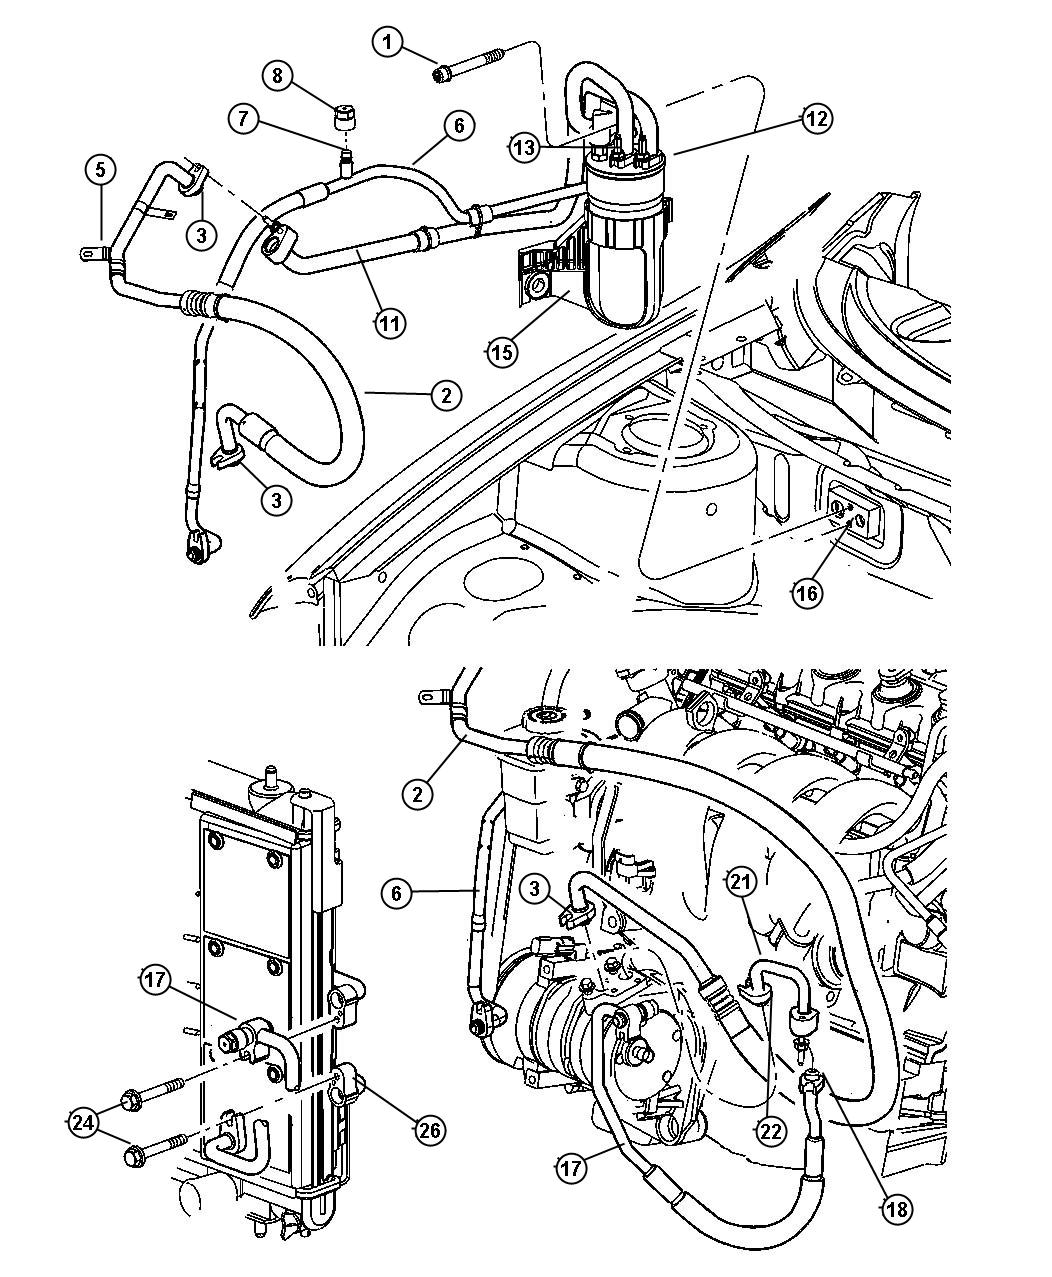 Dodge Nitro Condenser Air Conditioning Mopar